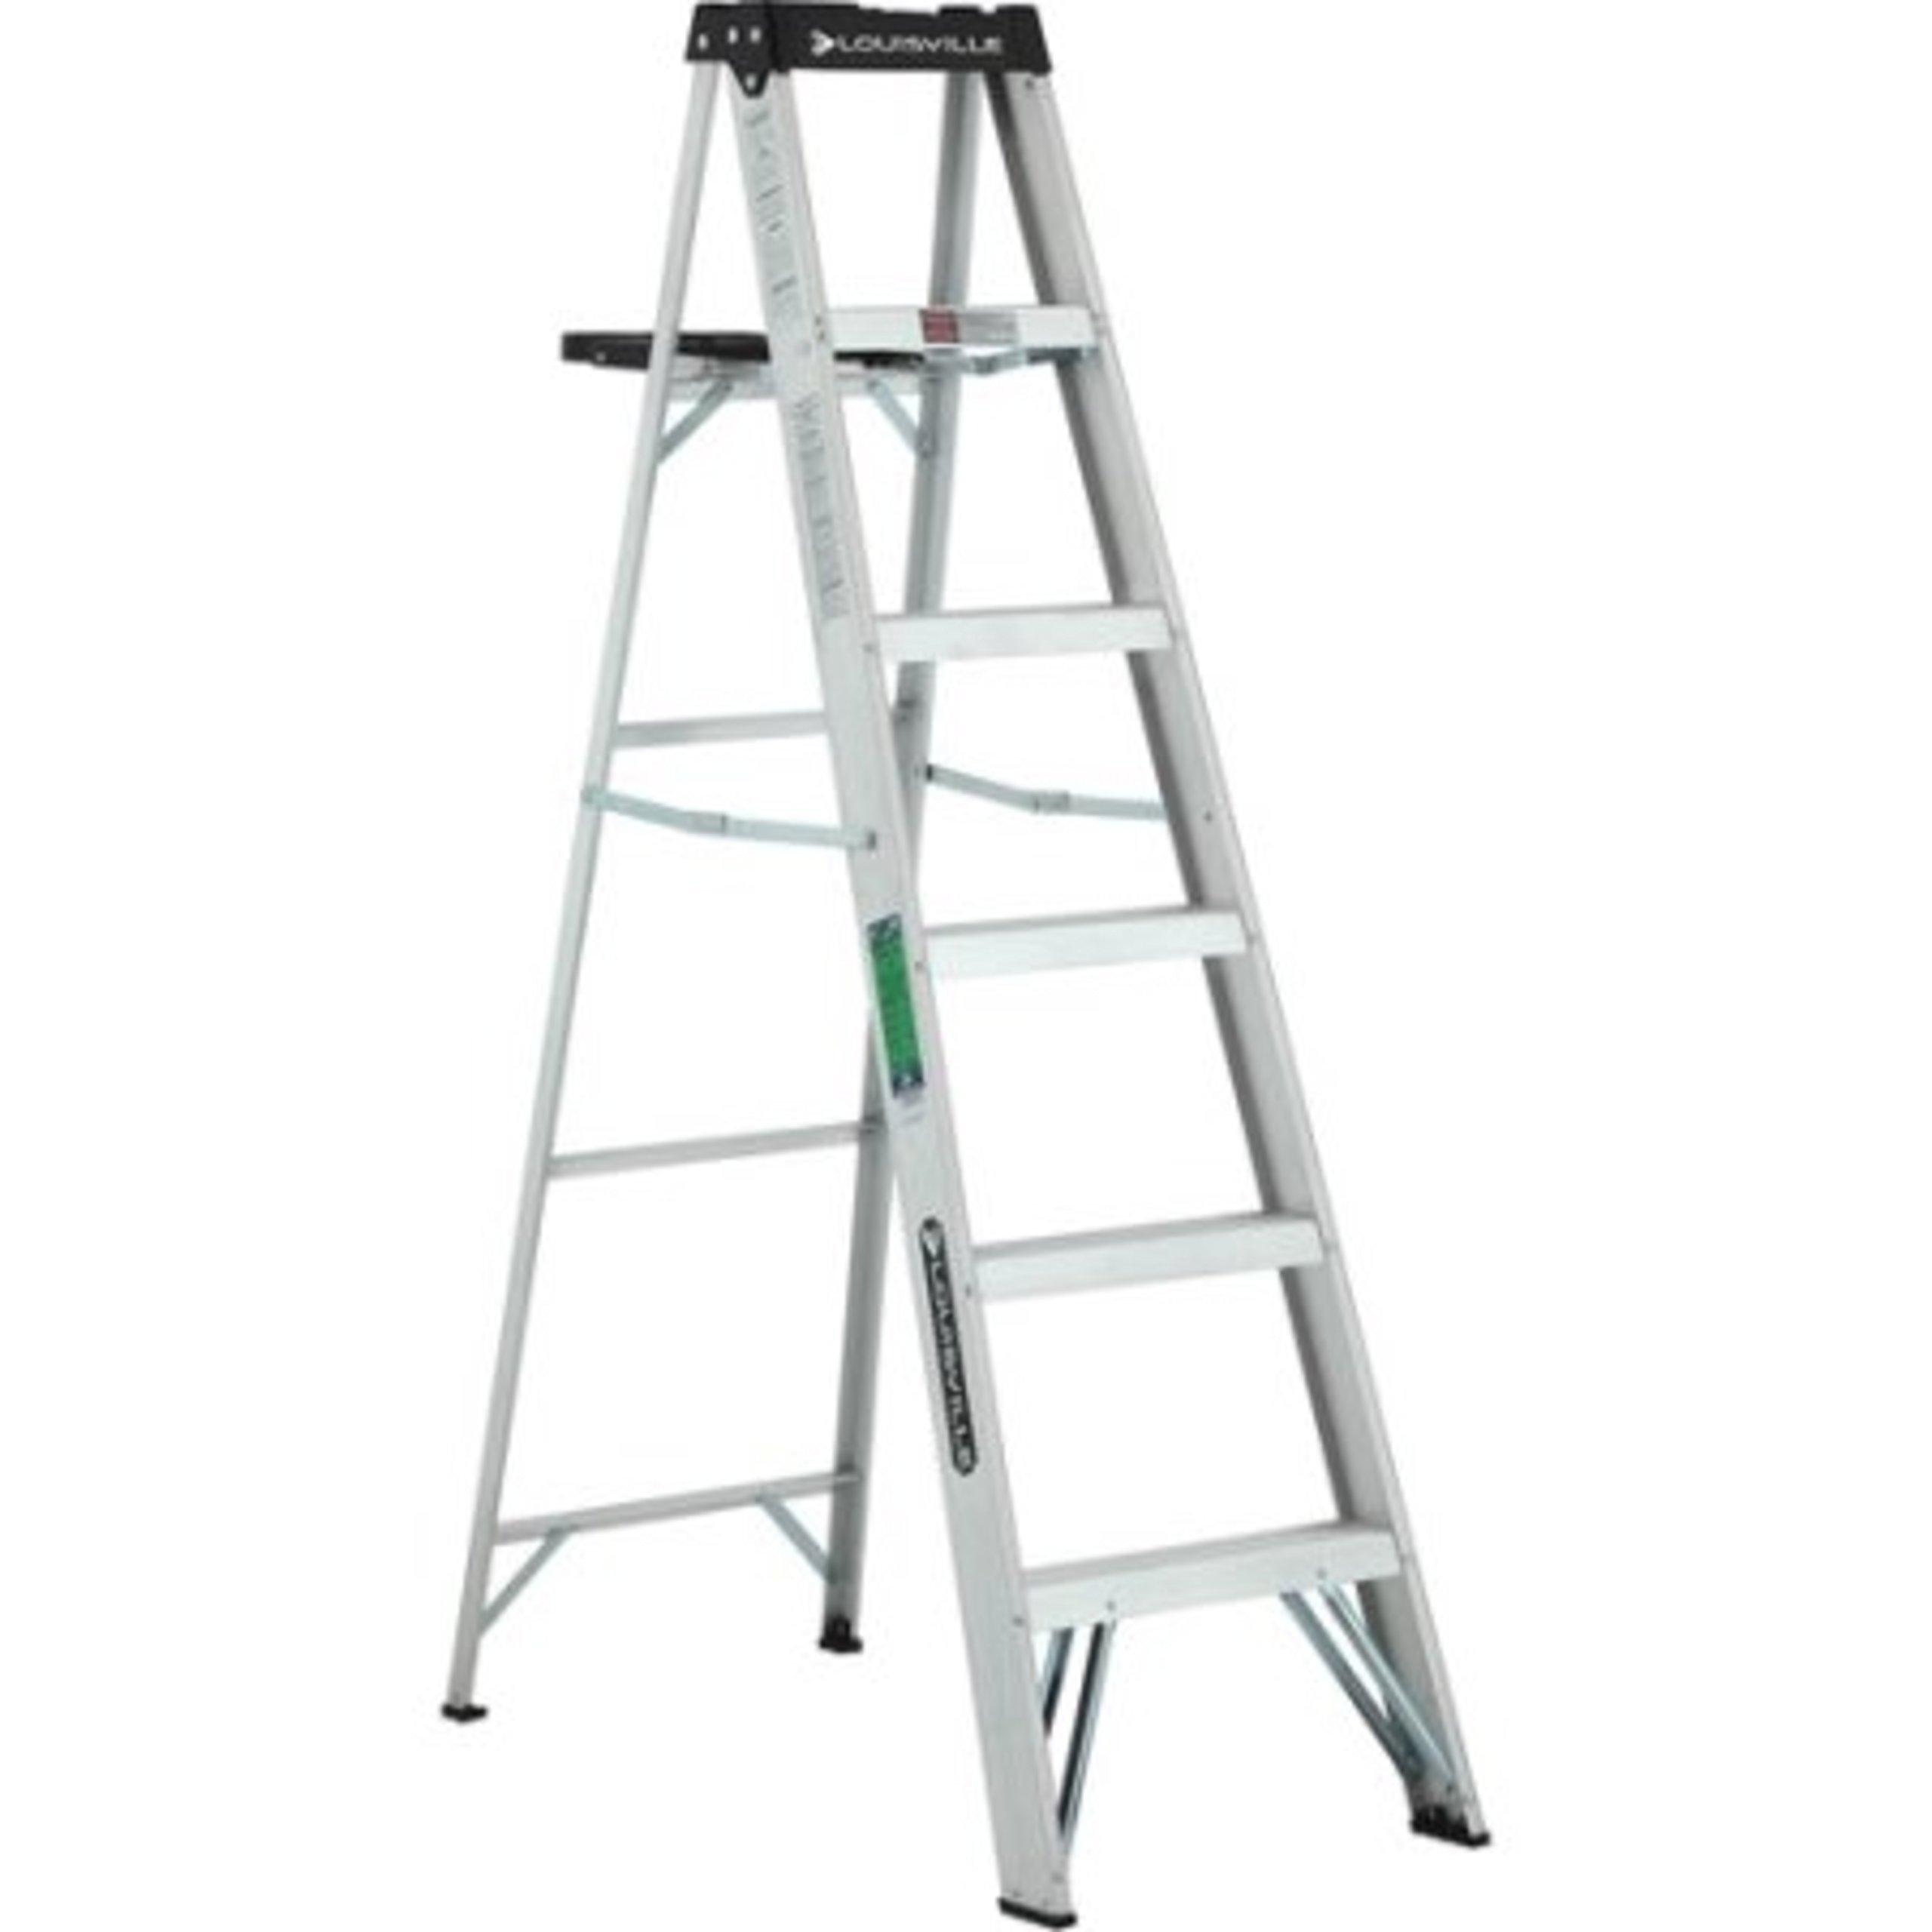 Aluminum Lightweight Molded Plastic Top Ladder